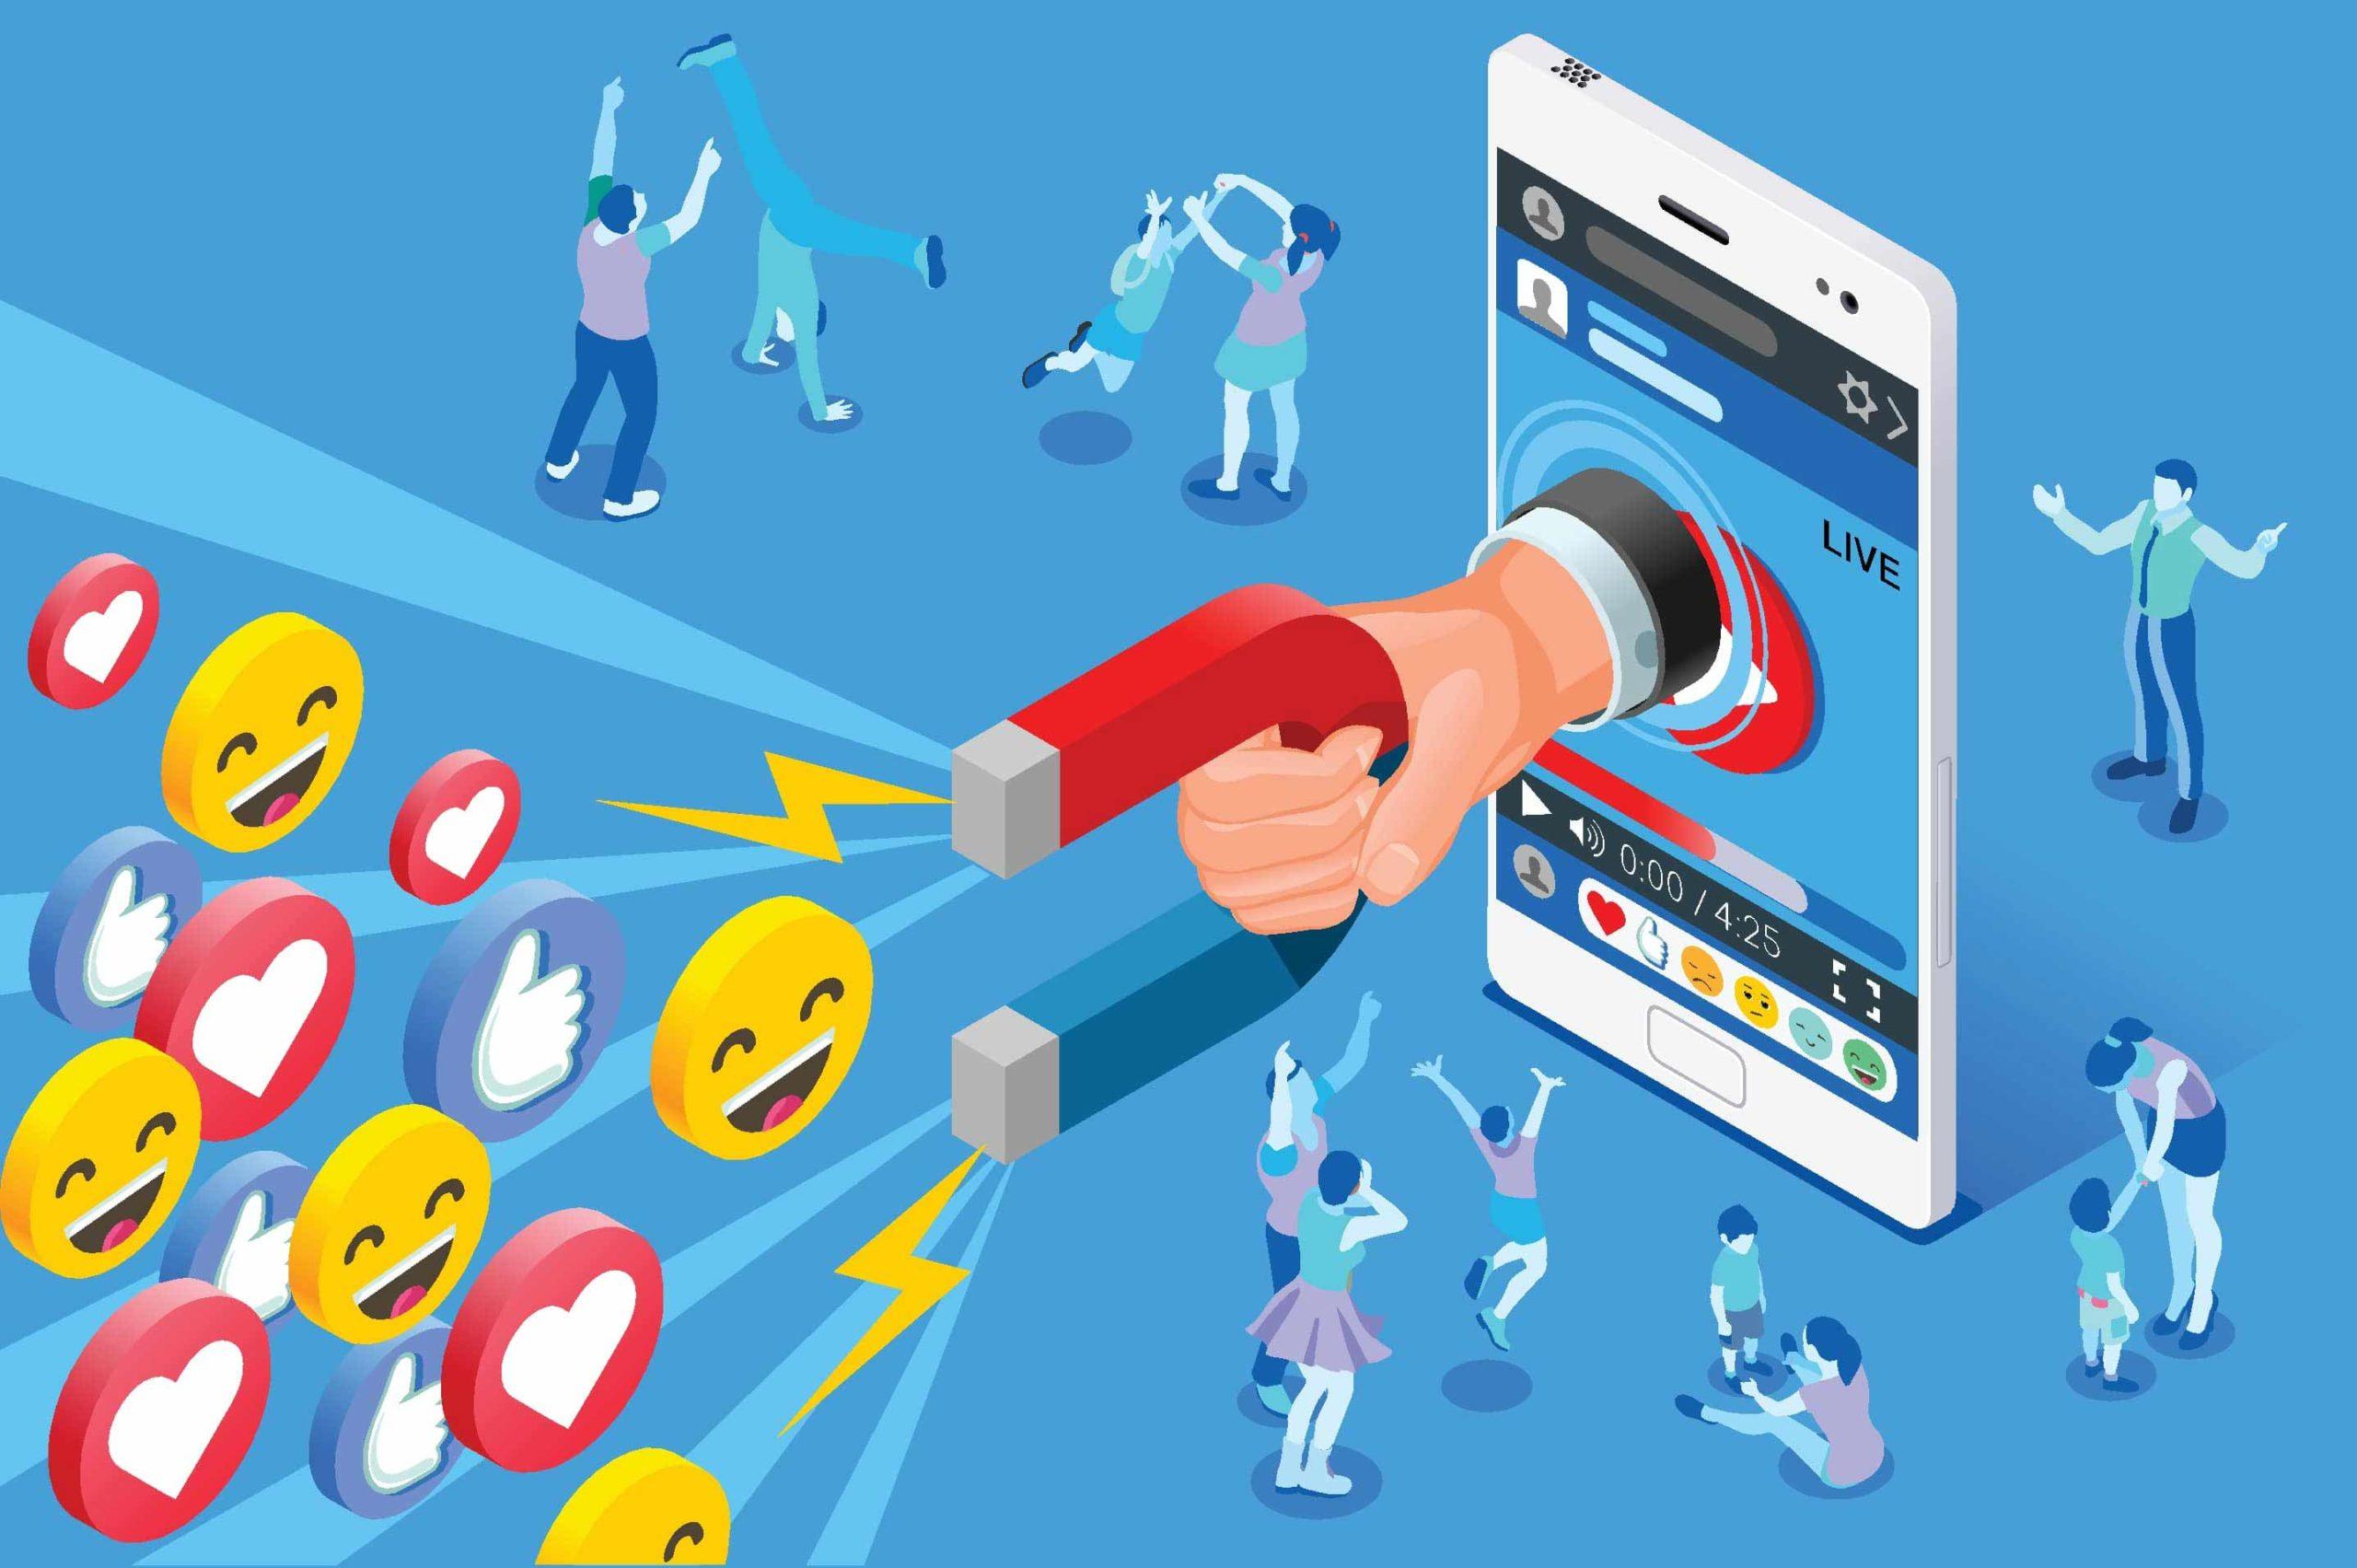 ikadia-blog-marketing-video-strategie-communication-digitale2